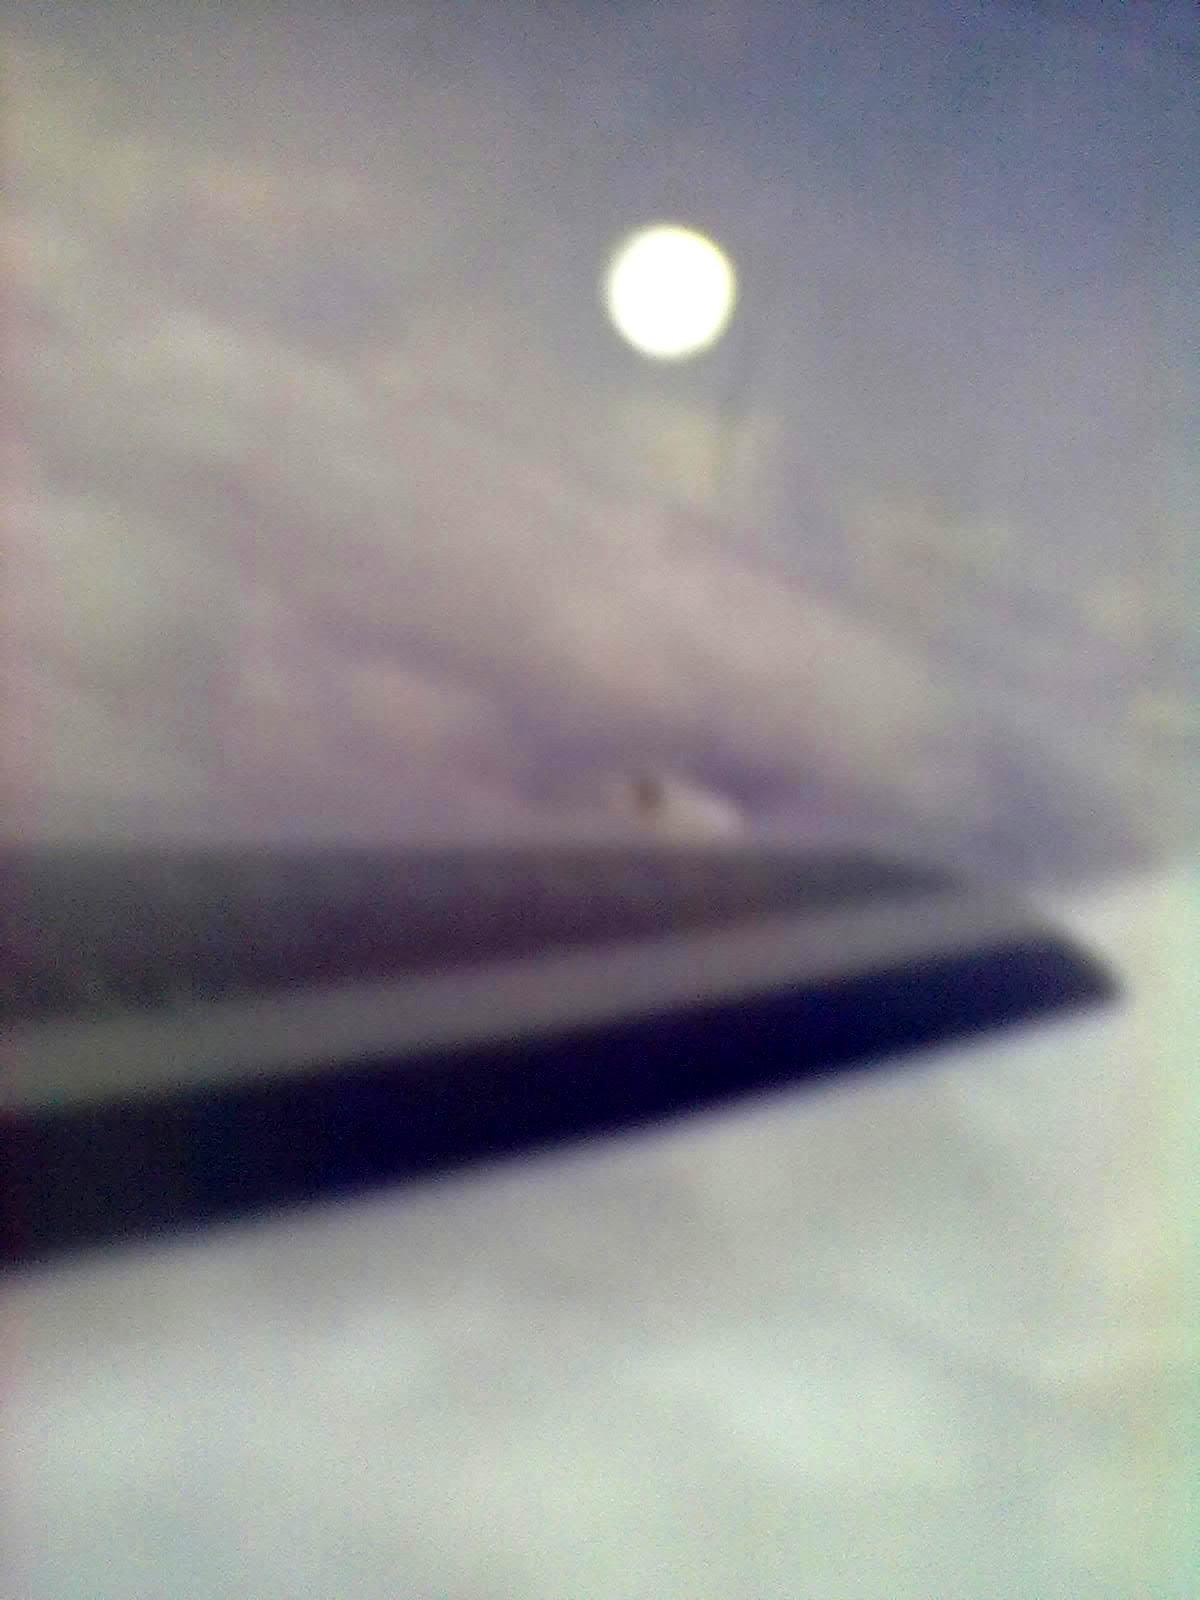 http://www.ufocasebook.com/2011/riodj020711a.jpg